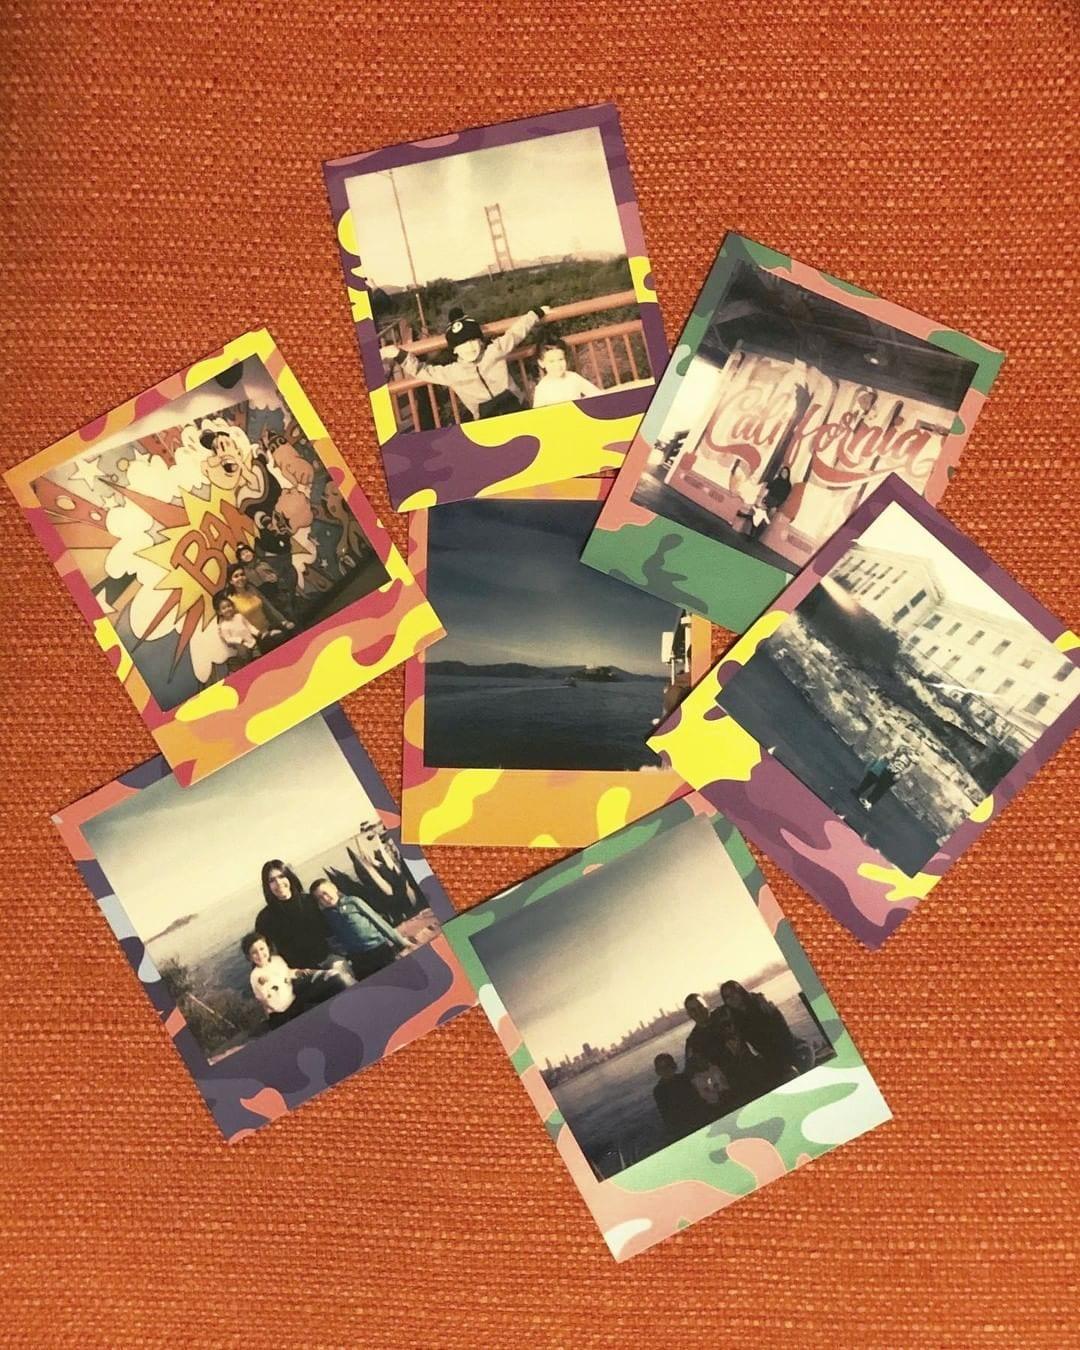 Creating memories one Polaroid at a time 📷 by @xo_lelyy #sanfrancisco #zephyrhotel #wharfdistrict #pier39 #alcatraz #roadtrip #polaroid #trishsdonuts